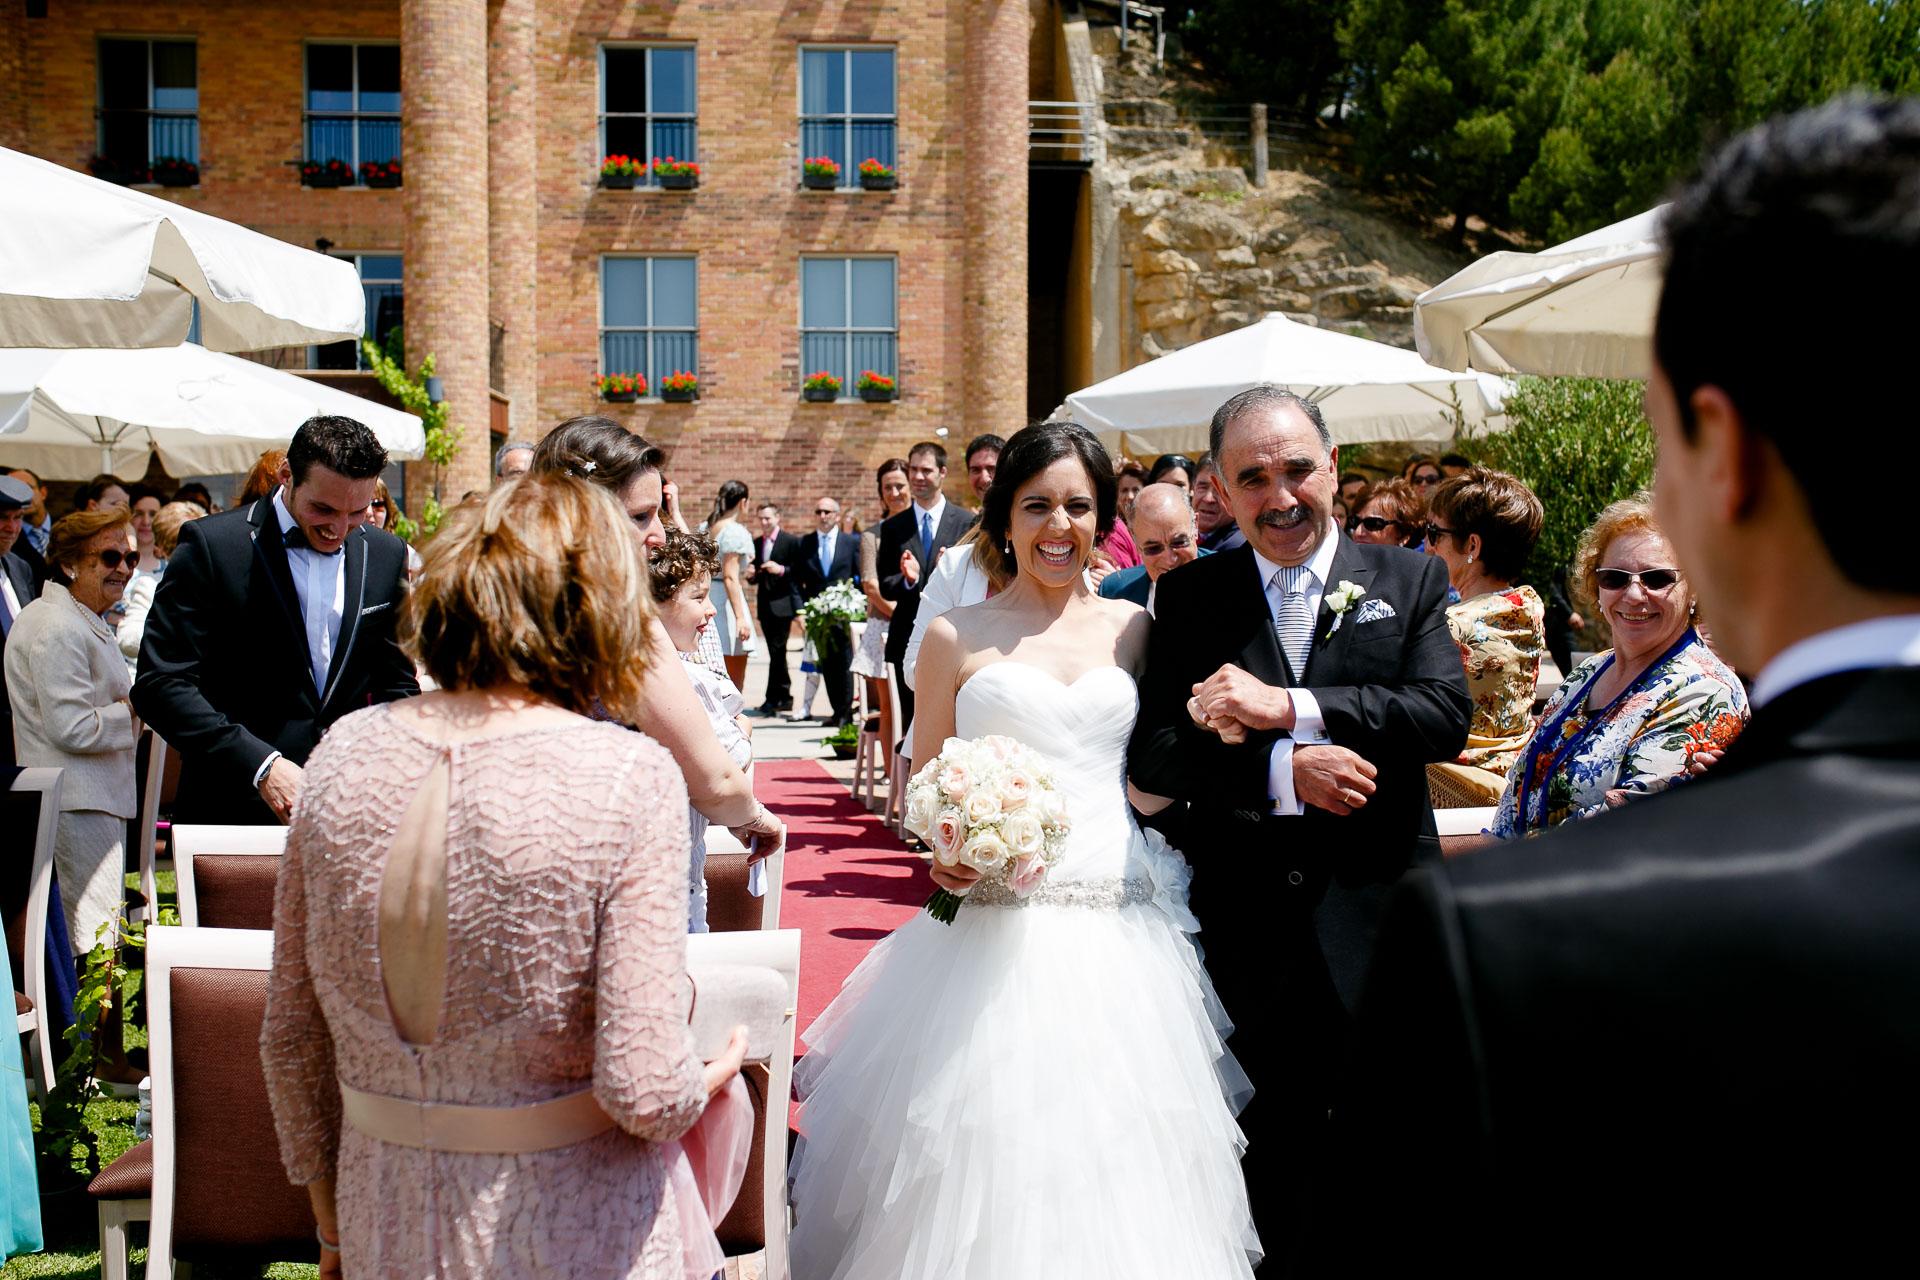 ceremonia boda bodegas eguren ugarte